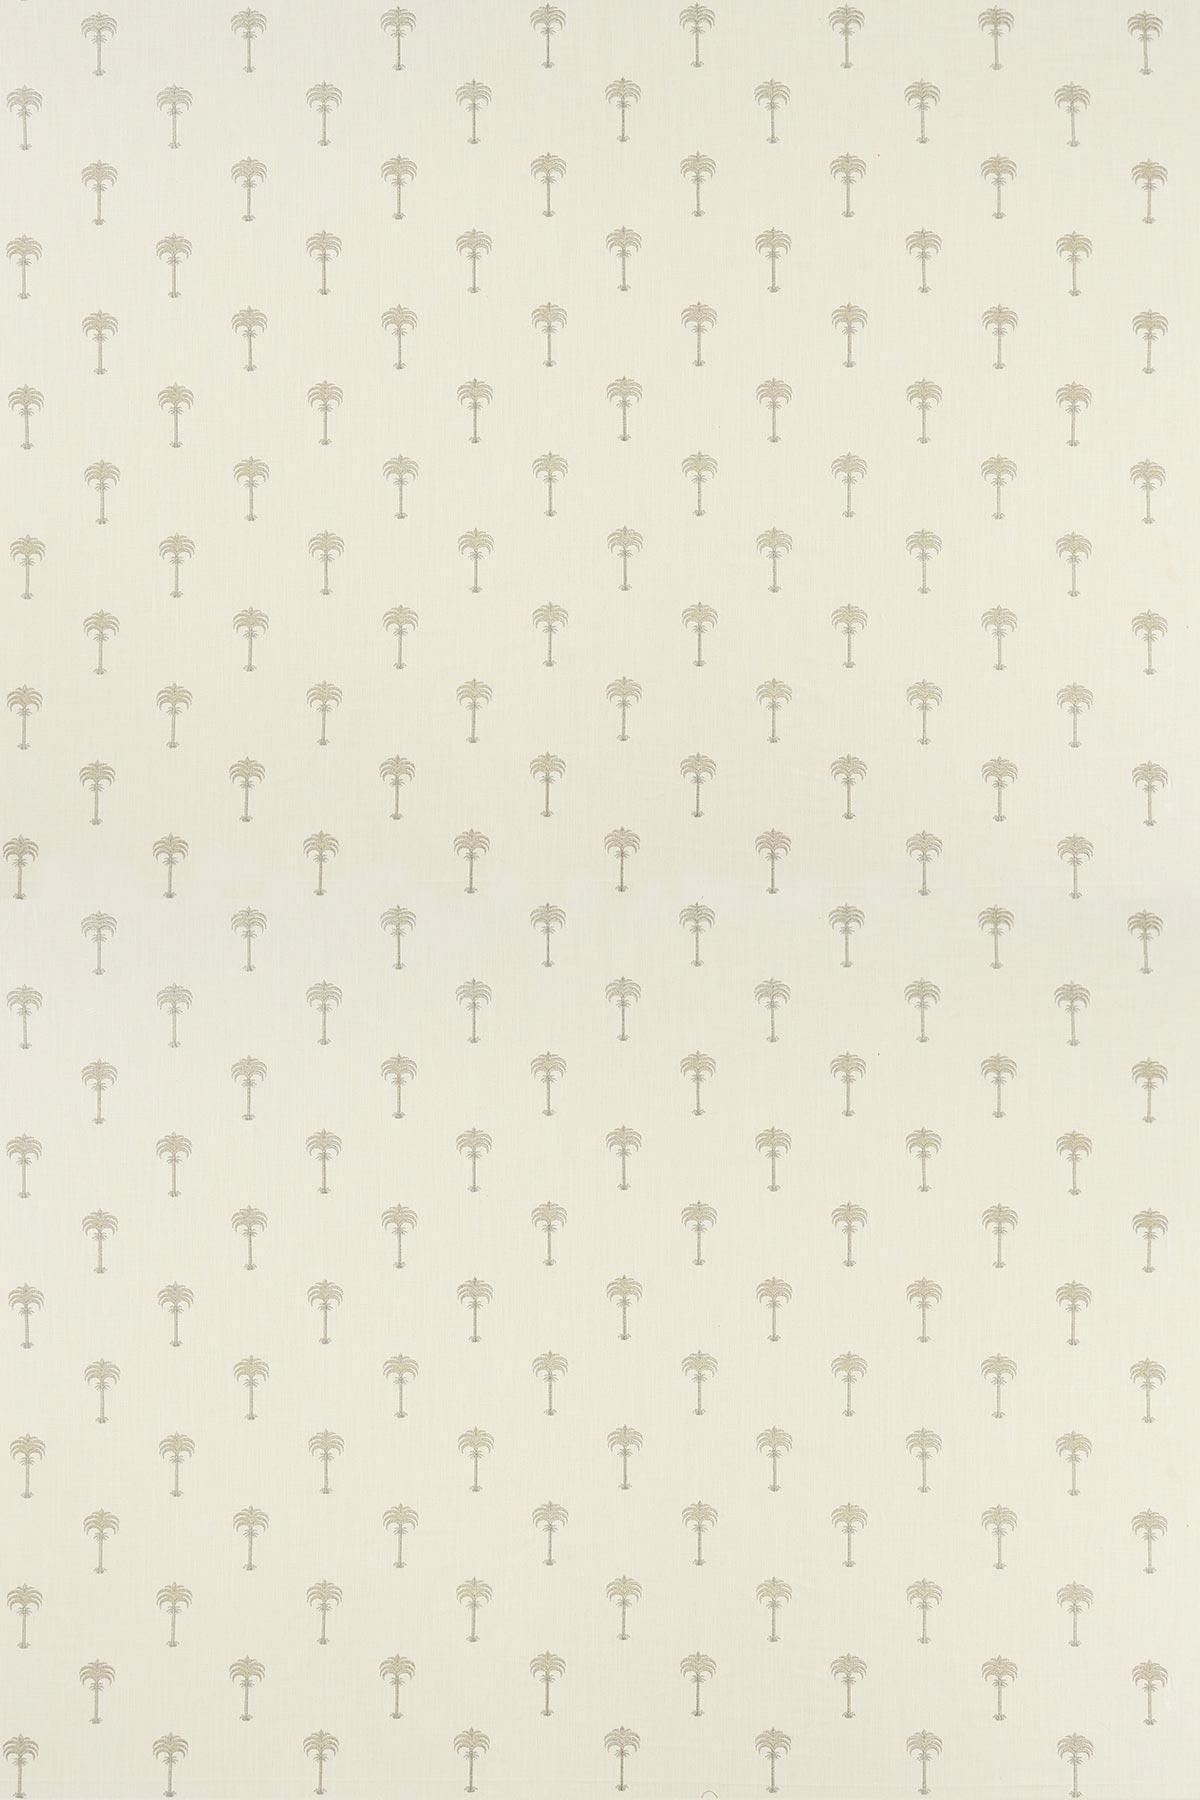 Menara metallic Fabric - Champagne / Ivory - by Clarke & Clarke